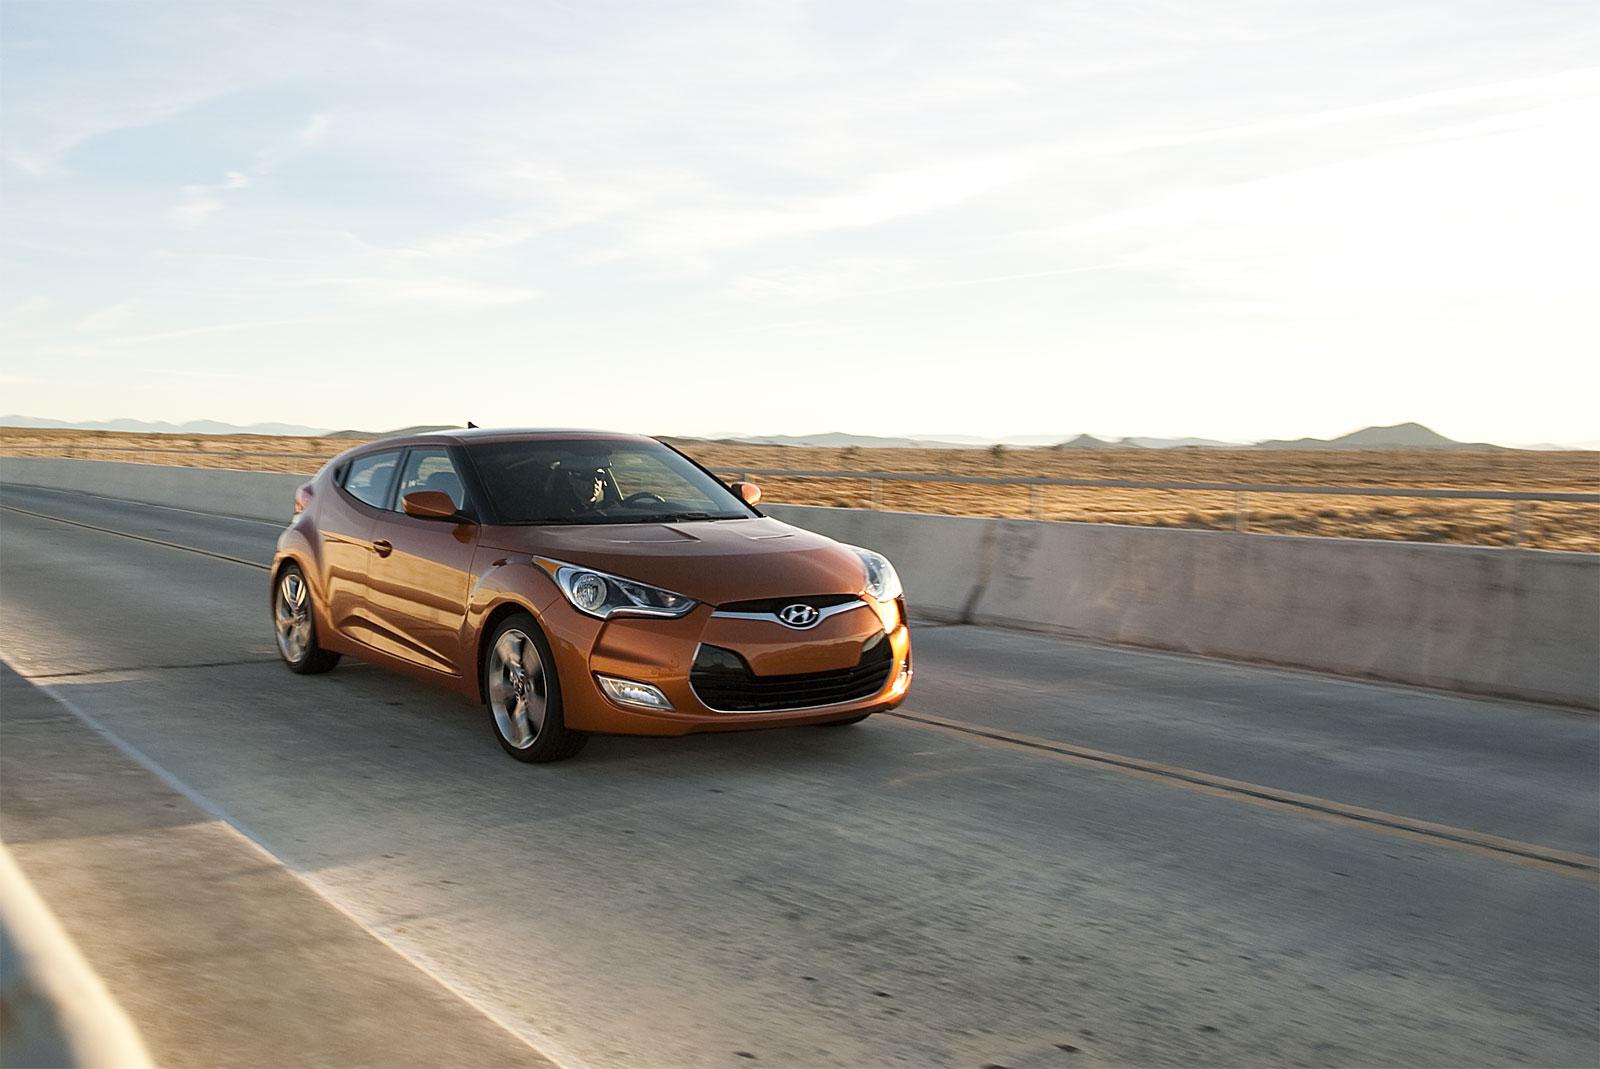 http://1.bp.blogspot.com/-WjW4MRw-BLE/T-FdqyBG_eI/AAAAAAAADqQ/iIippxPObno/s1600/Hyundai+Veloster+hd+Wallpapers+2012_3.jpg